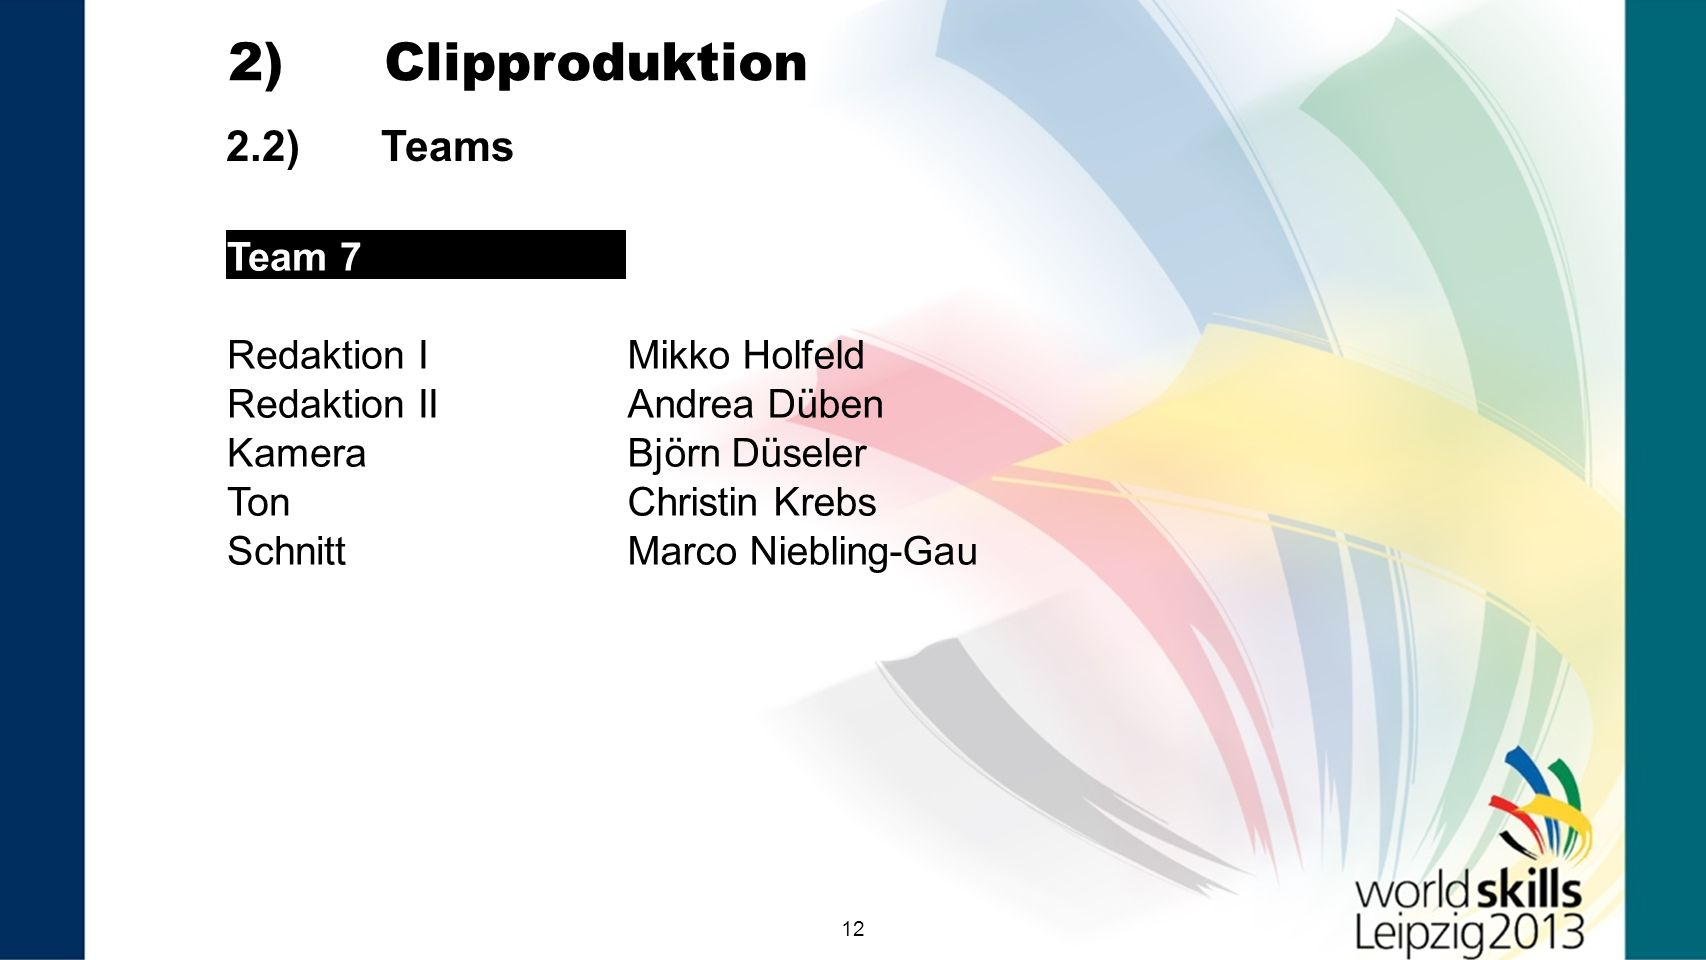 2) Clipproduktion 2.2) Teams Team 7 Redaktion I Mikko Holfeld